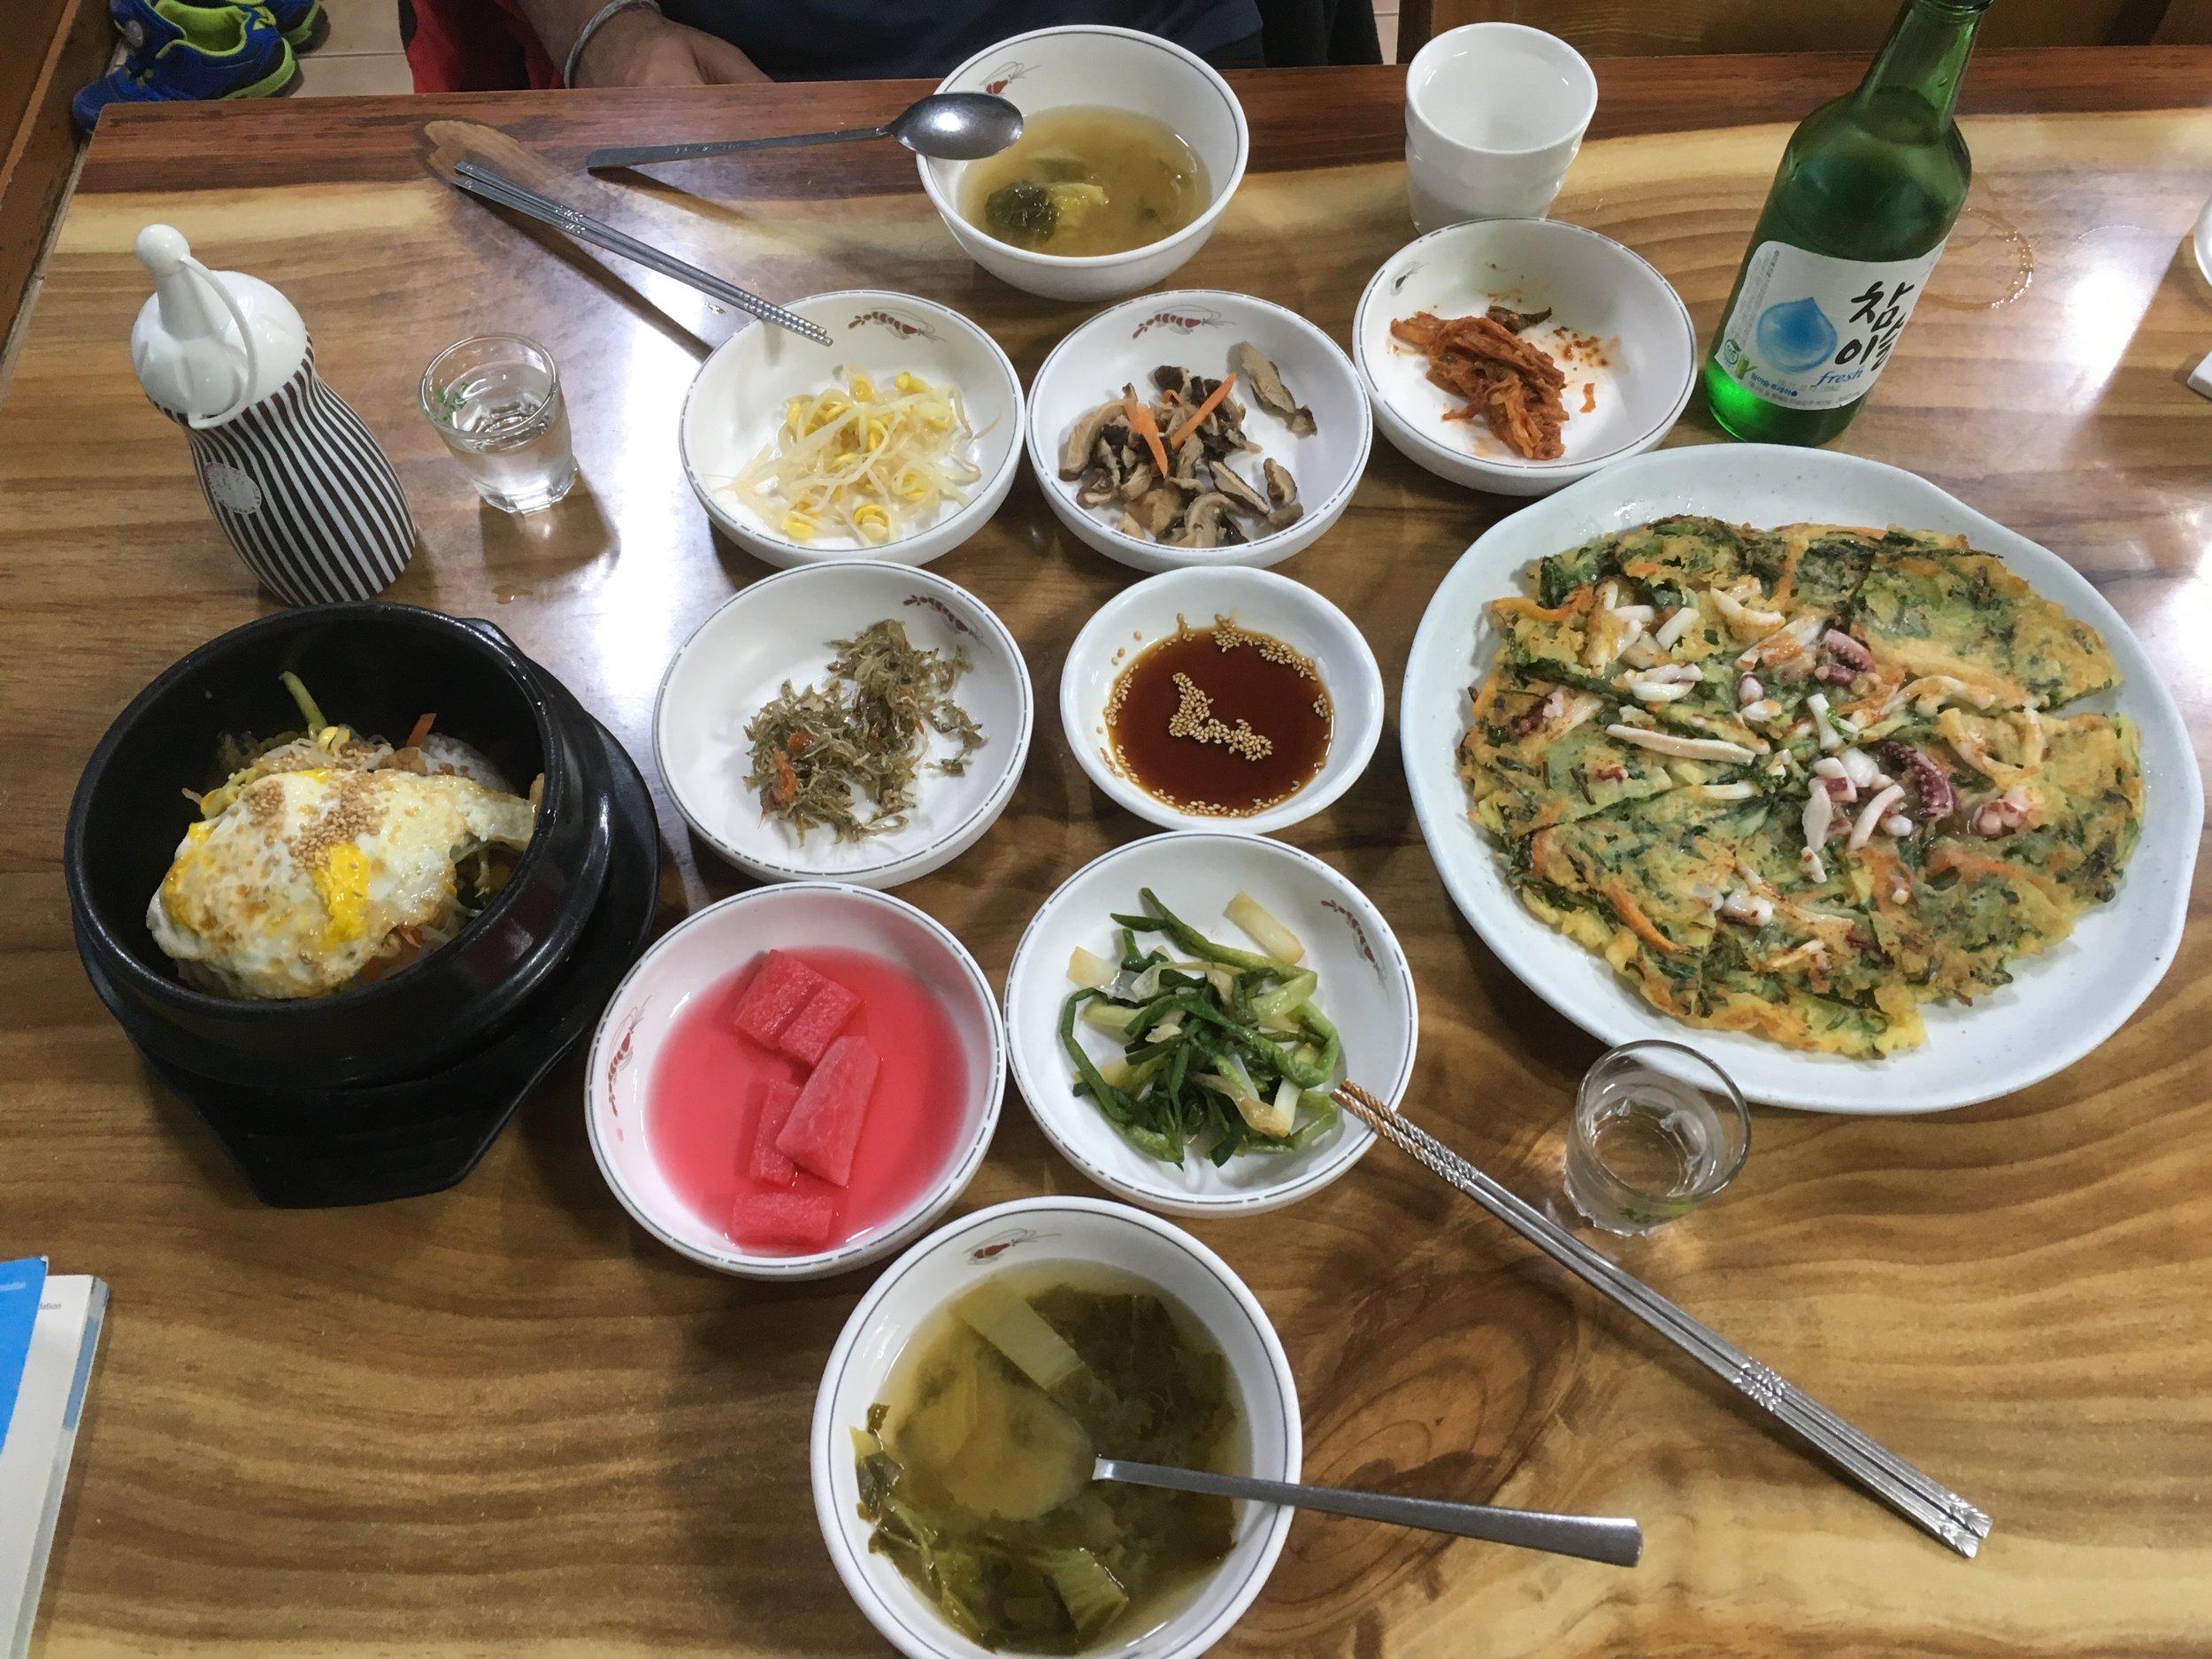 Delicious traditional Korean meal